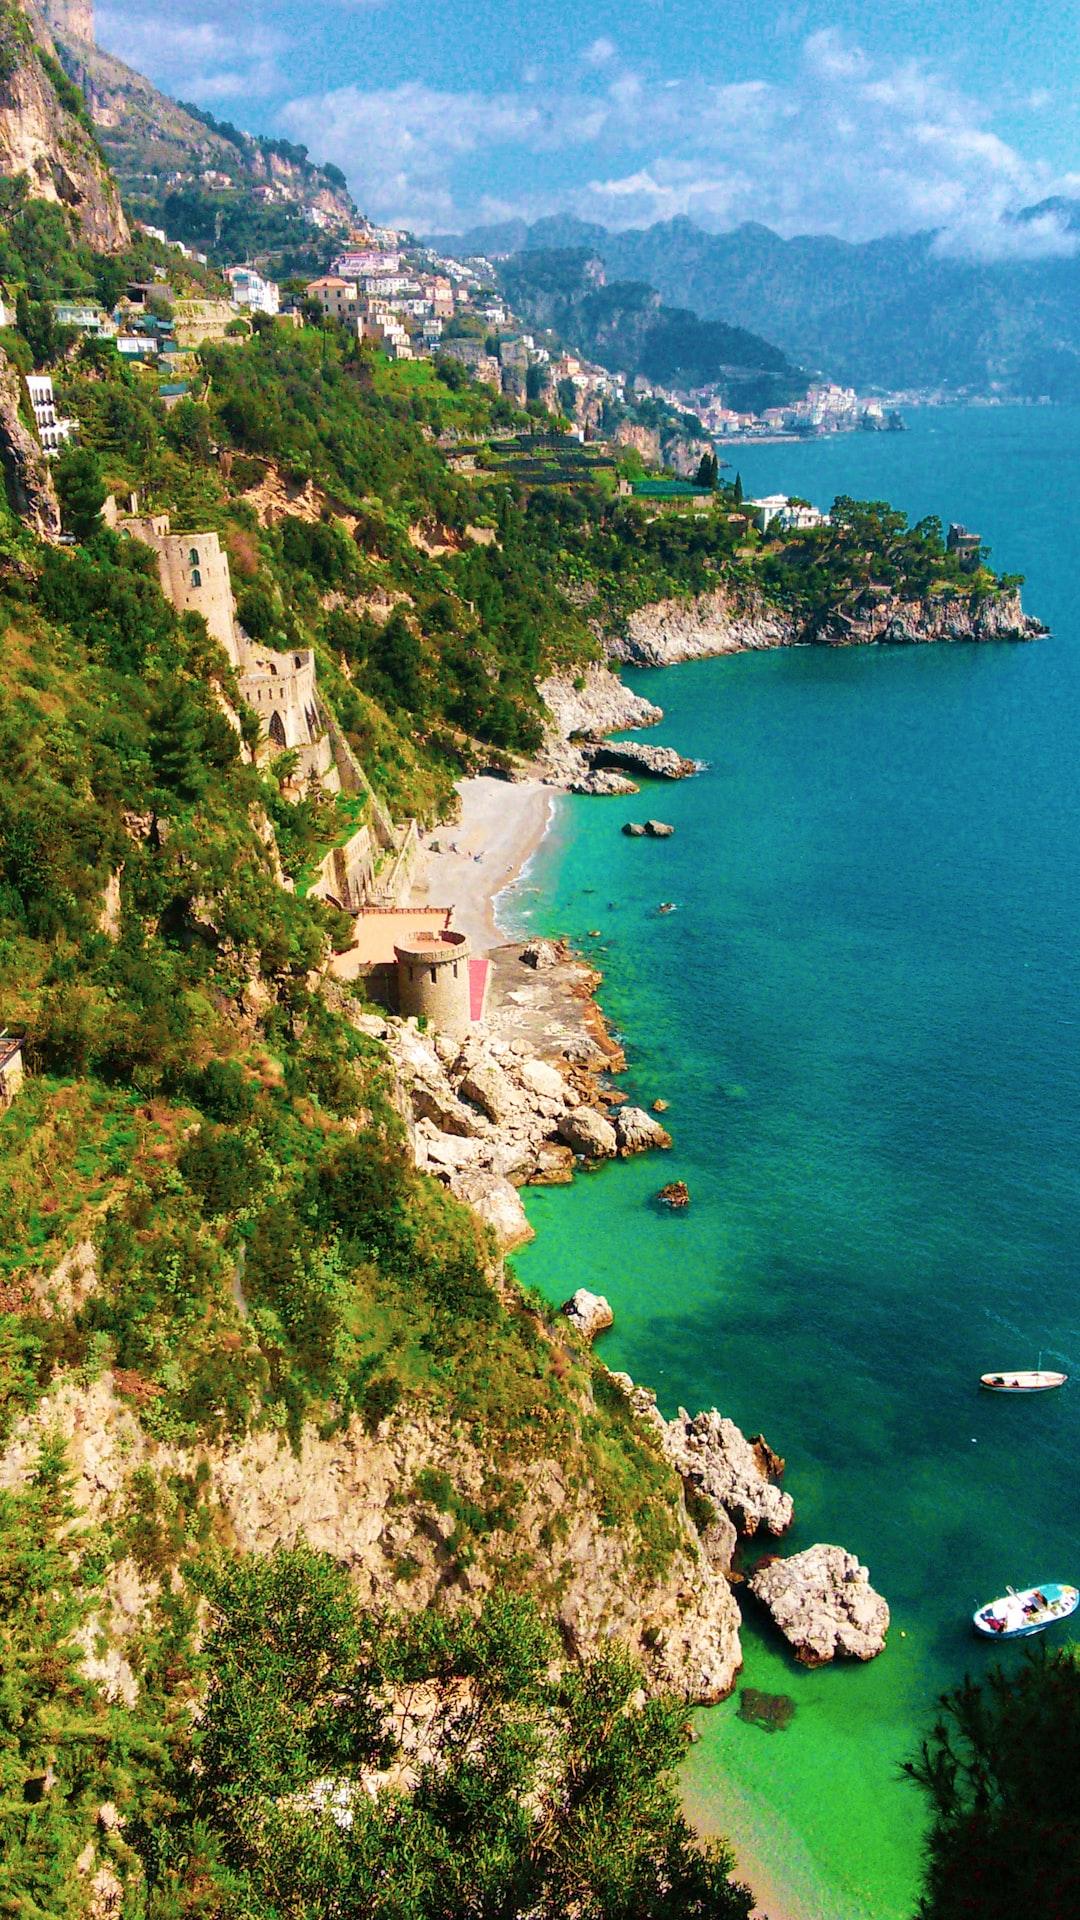 Summer is coming in the Amalfitan Coast